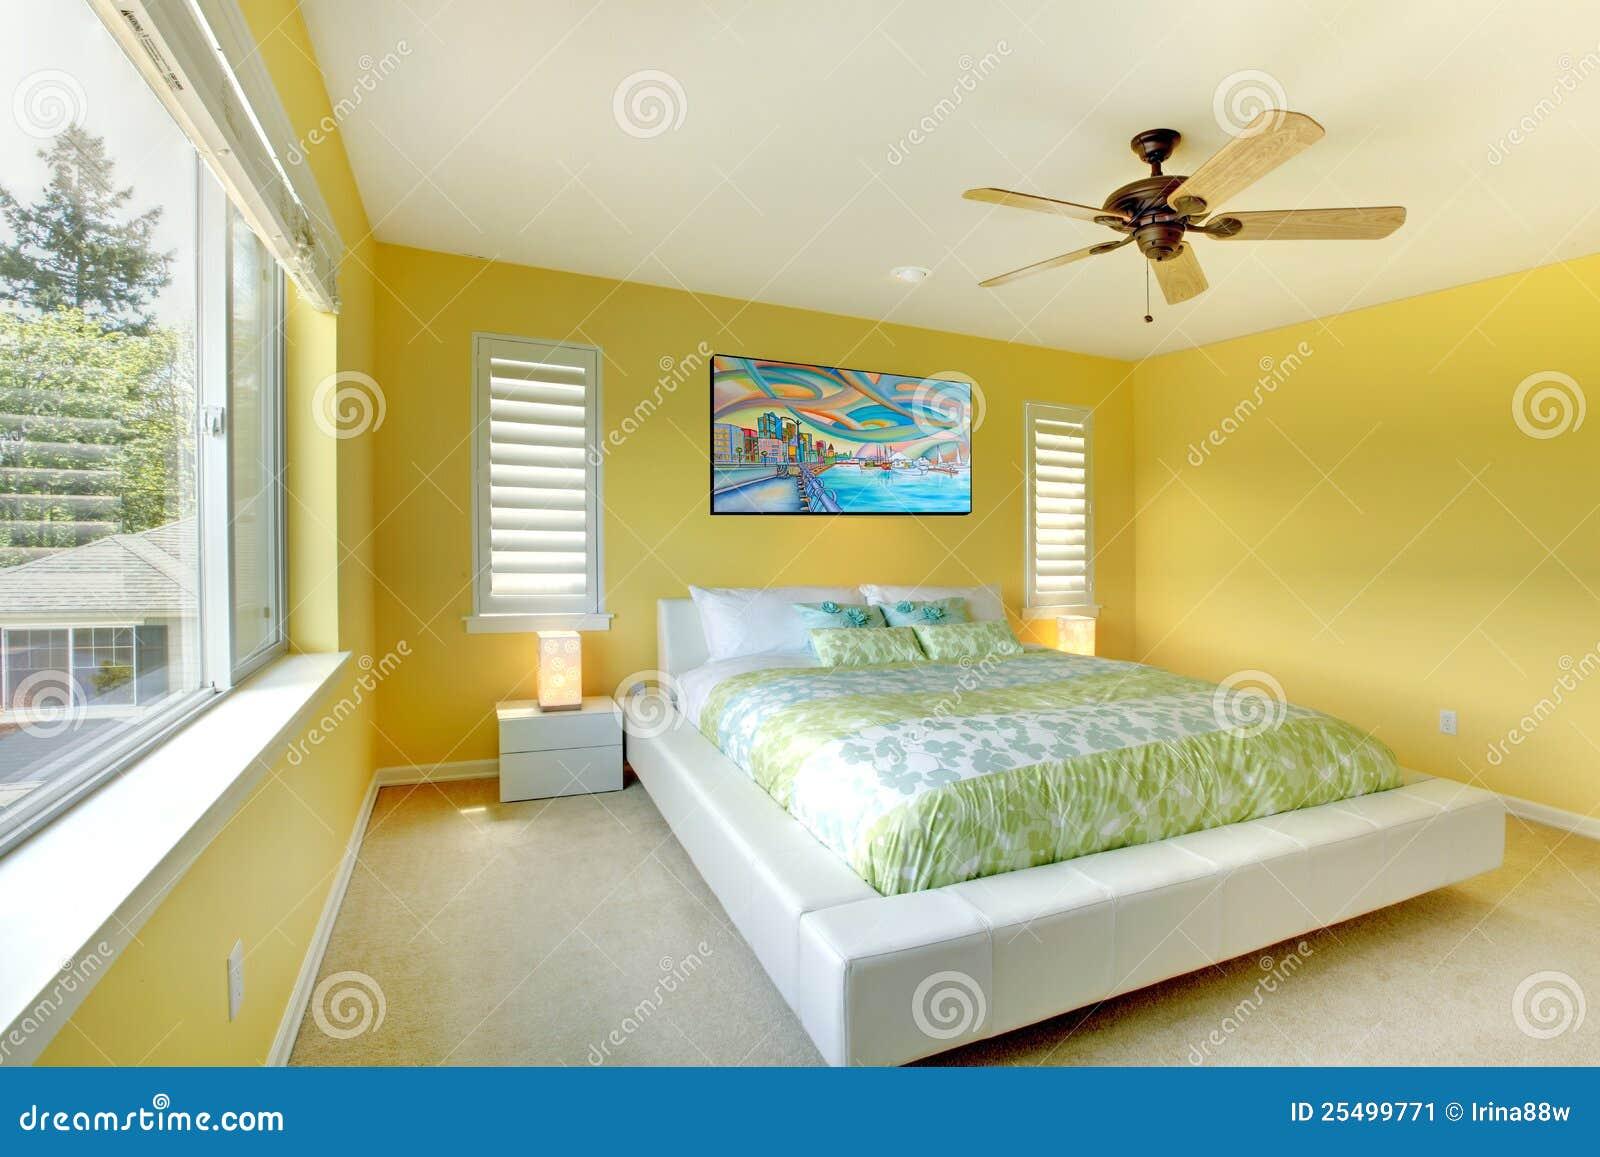 Slaapkamer Groen Bruin : Slaapkamer groen bruin u artsmedia